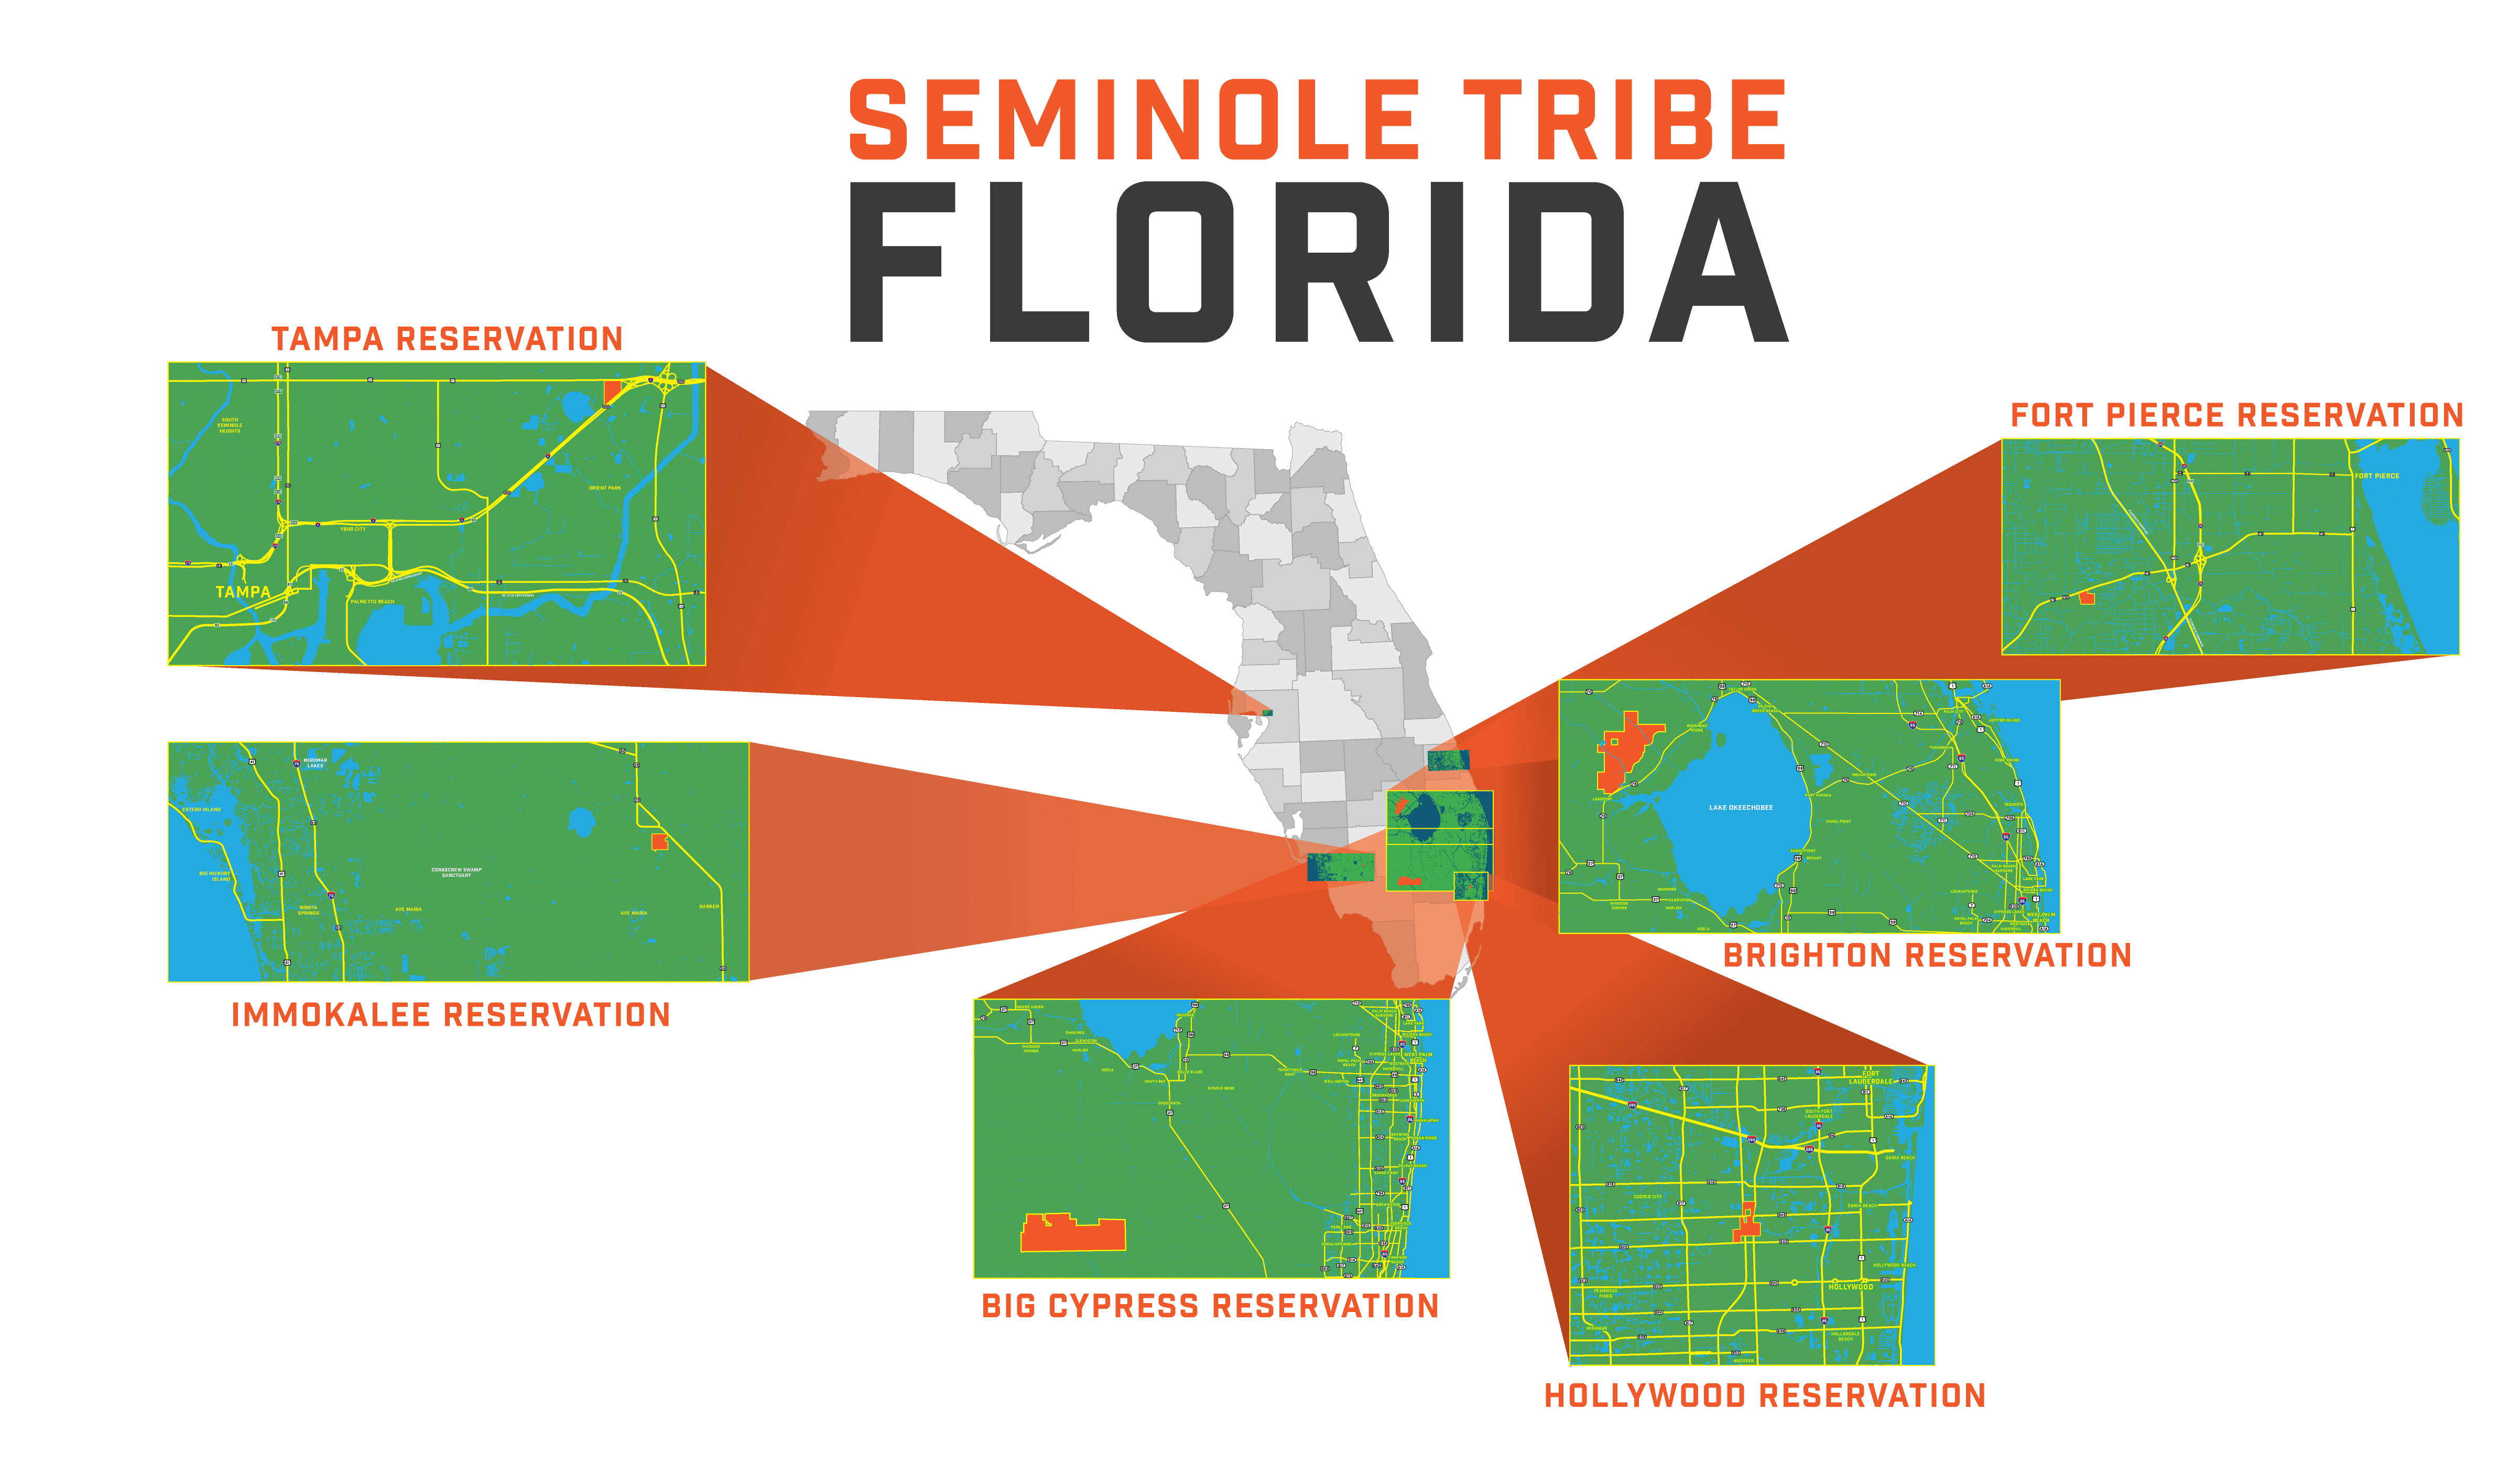 Seminole Tribe of Florida